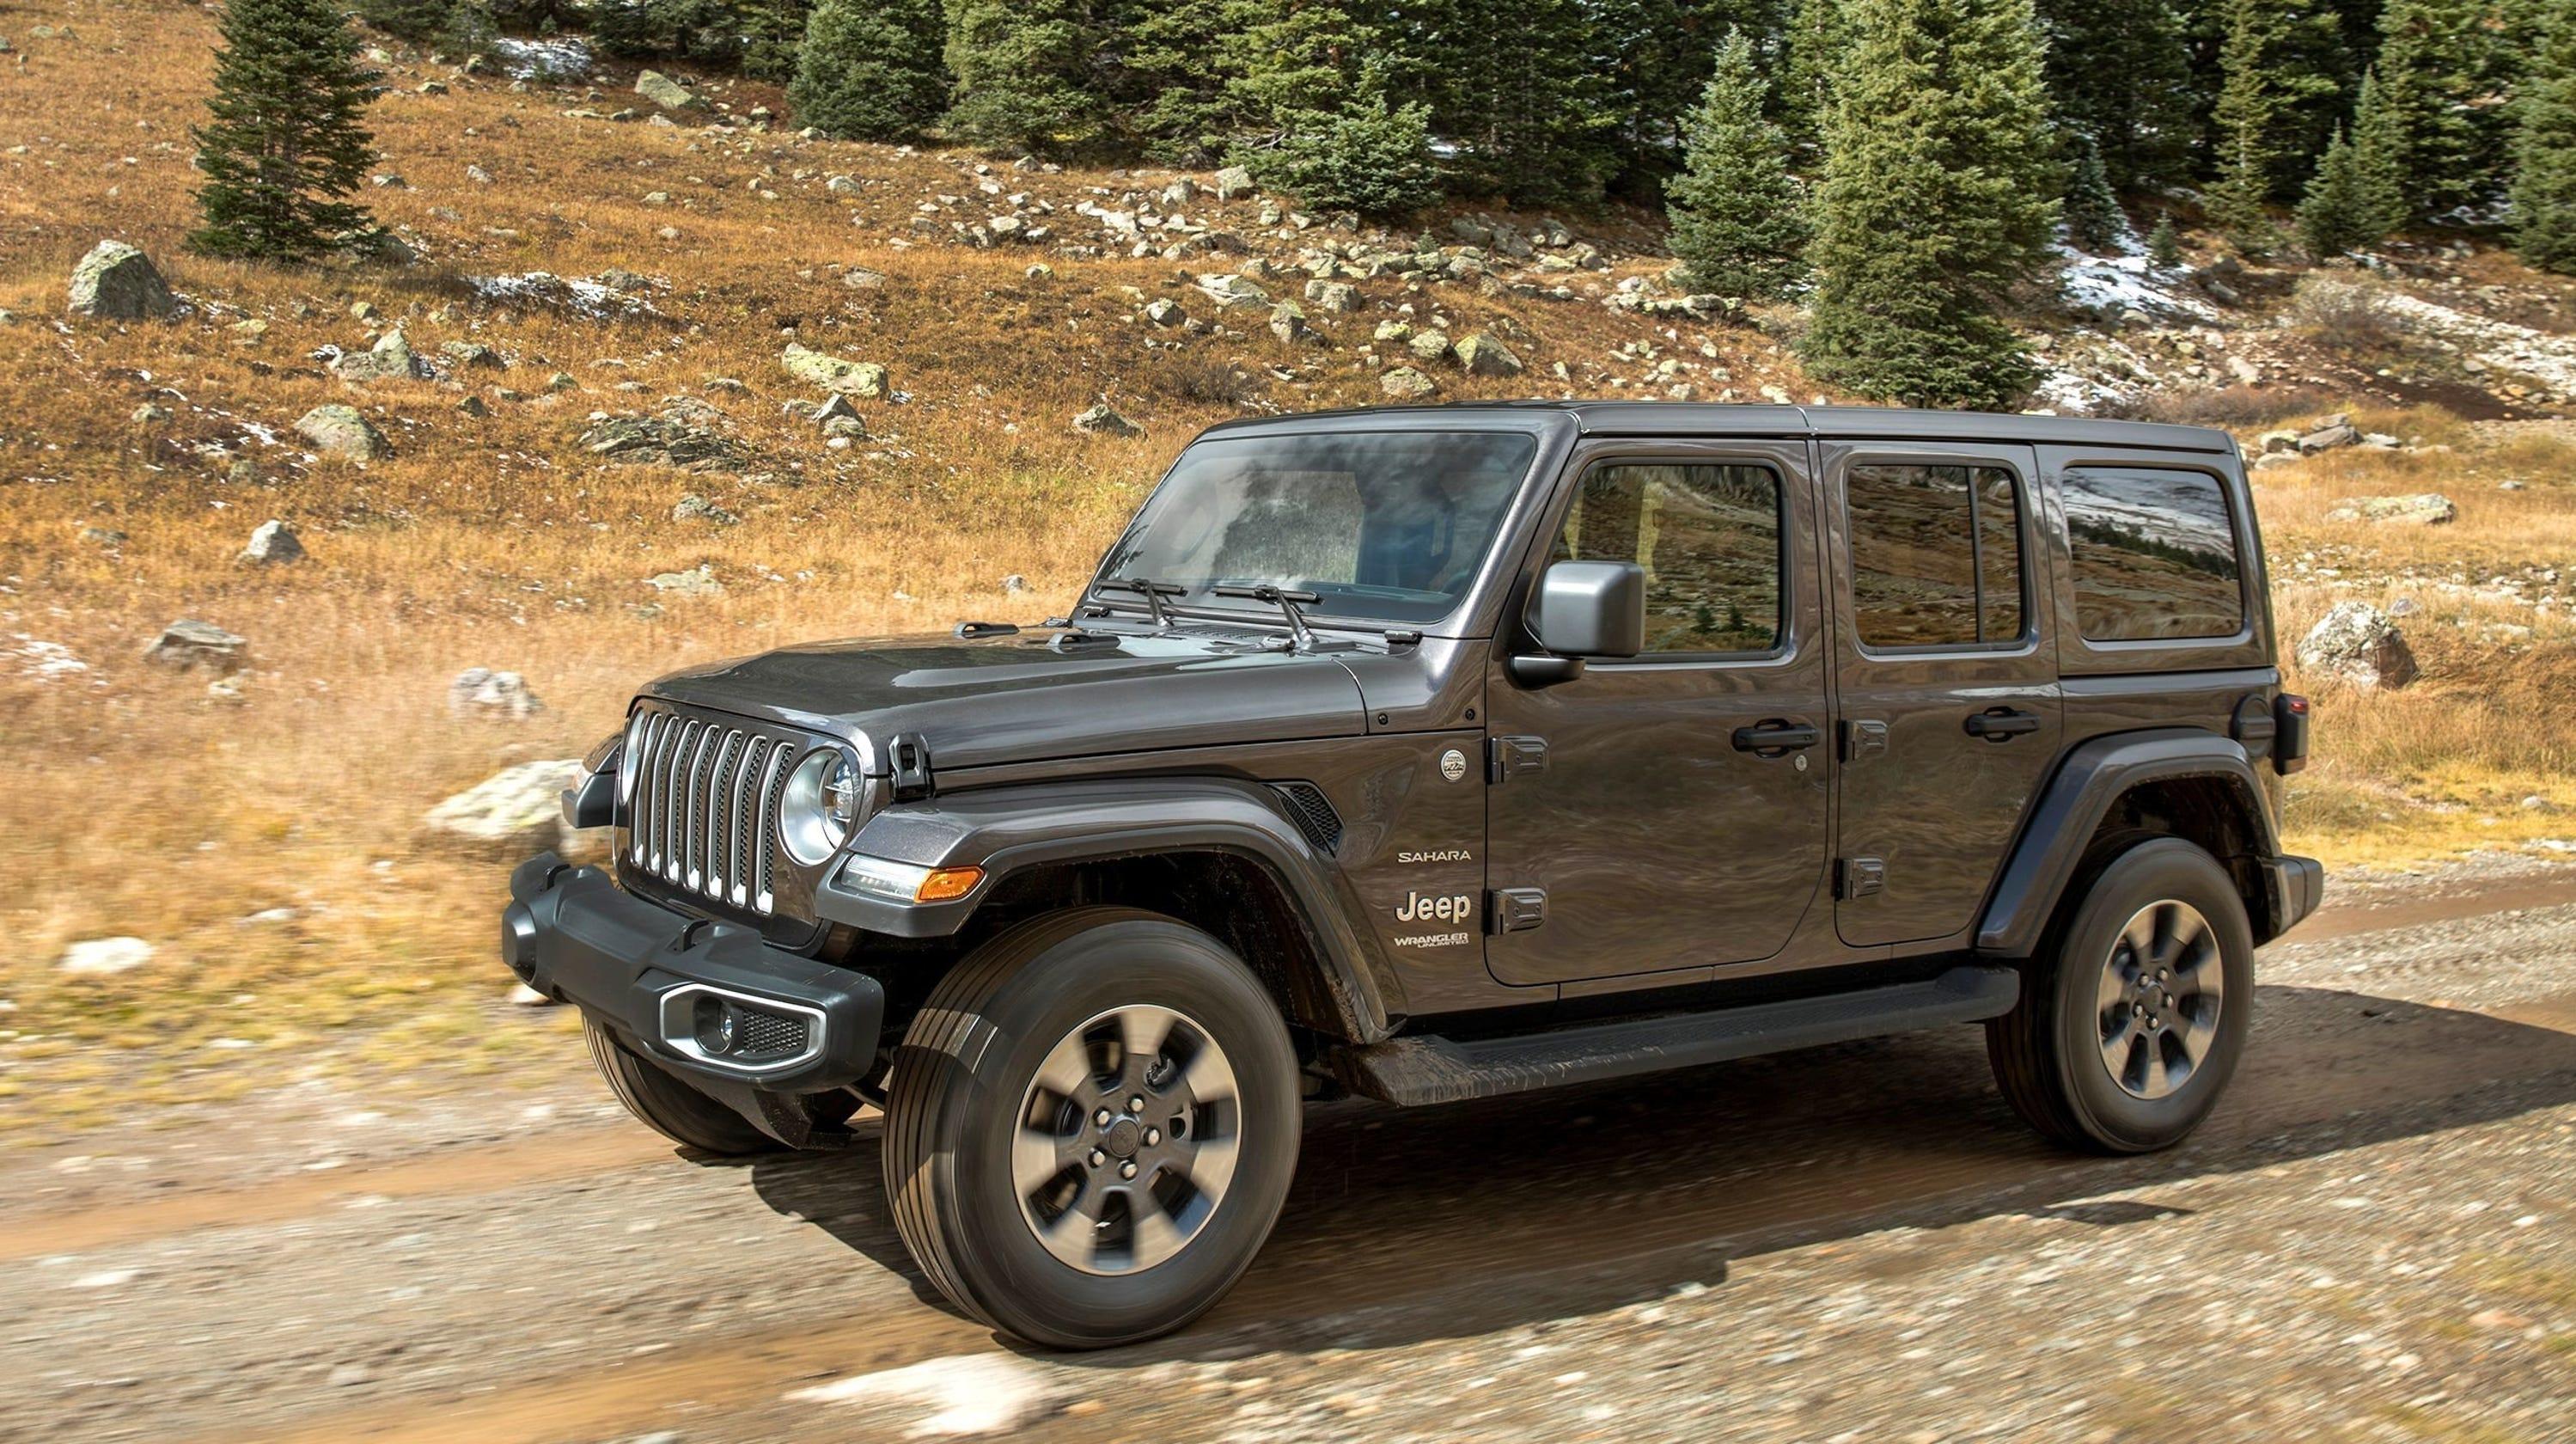 Jeep Wrangler Death Wobble Complaints Reach Nhtsa